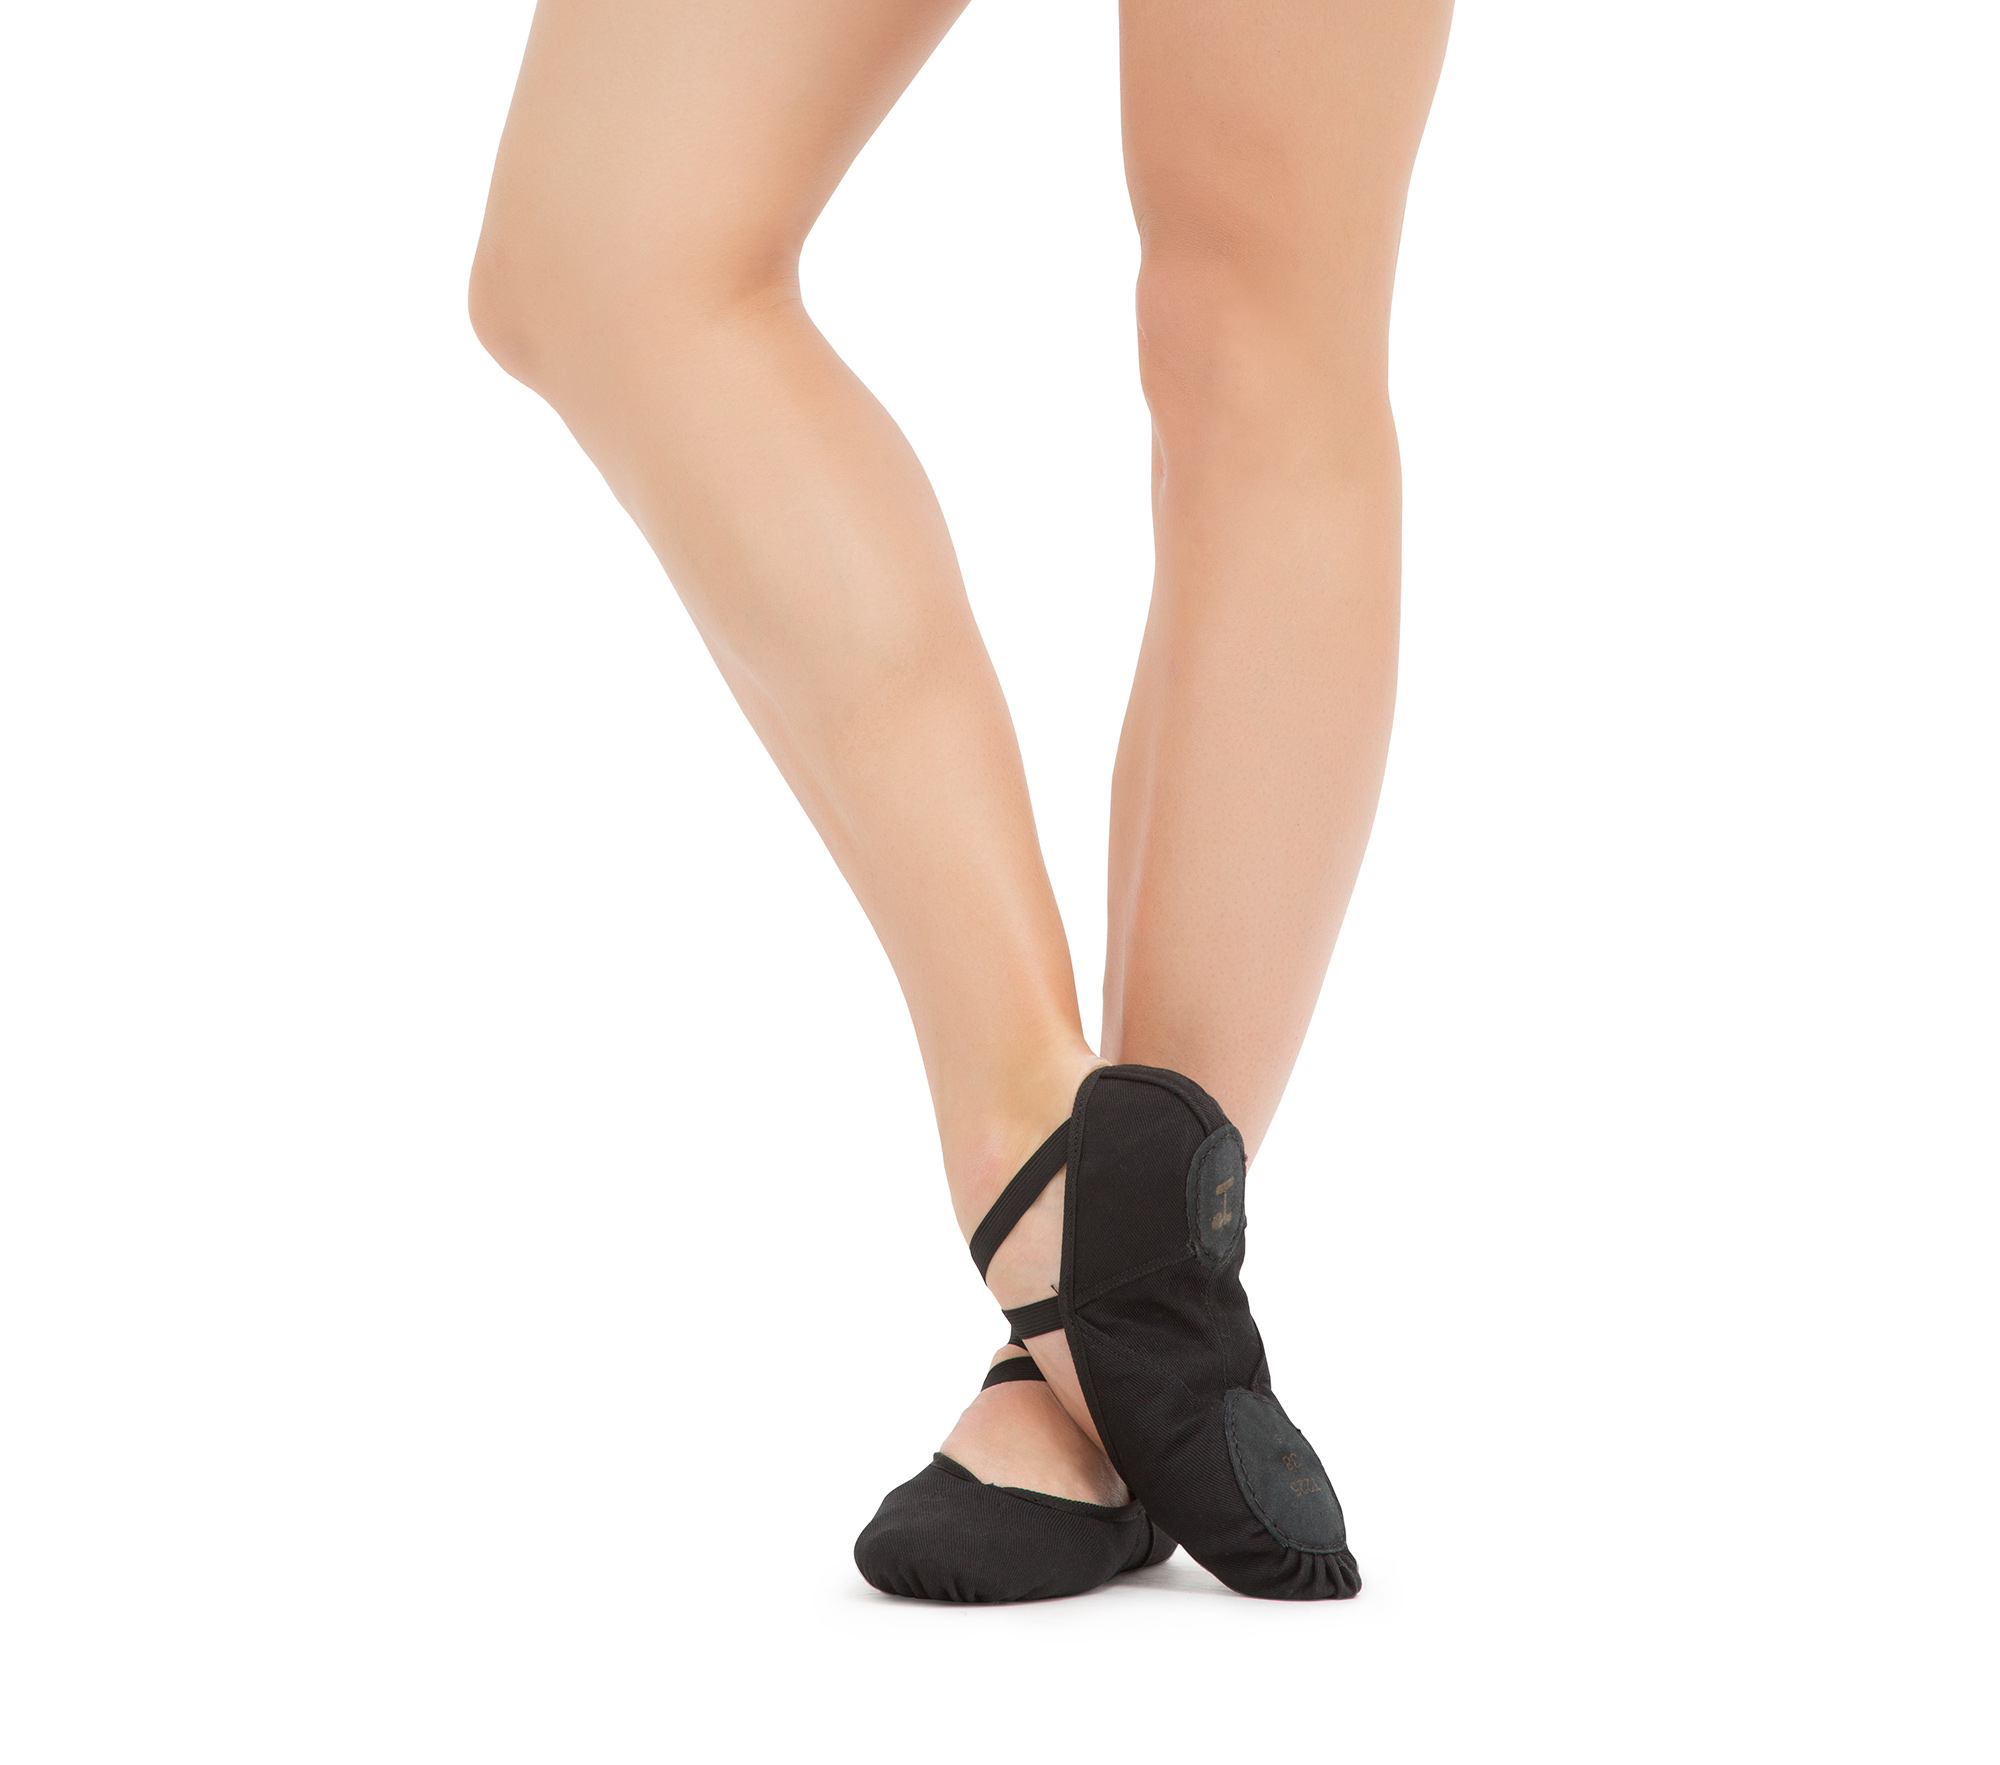 Soft ballet shoes with split sole